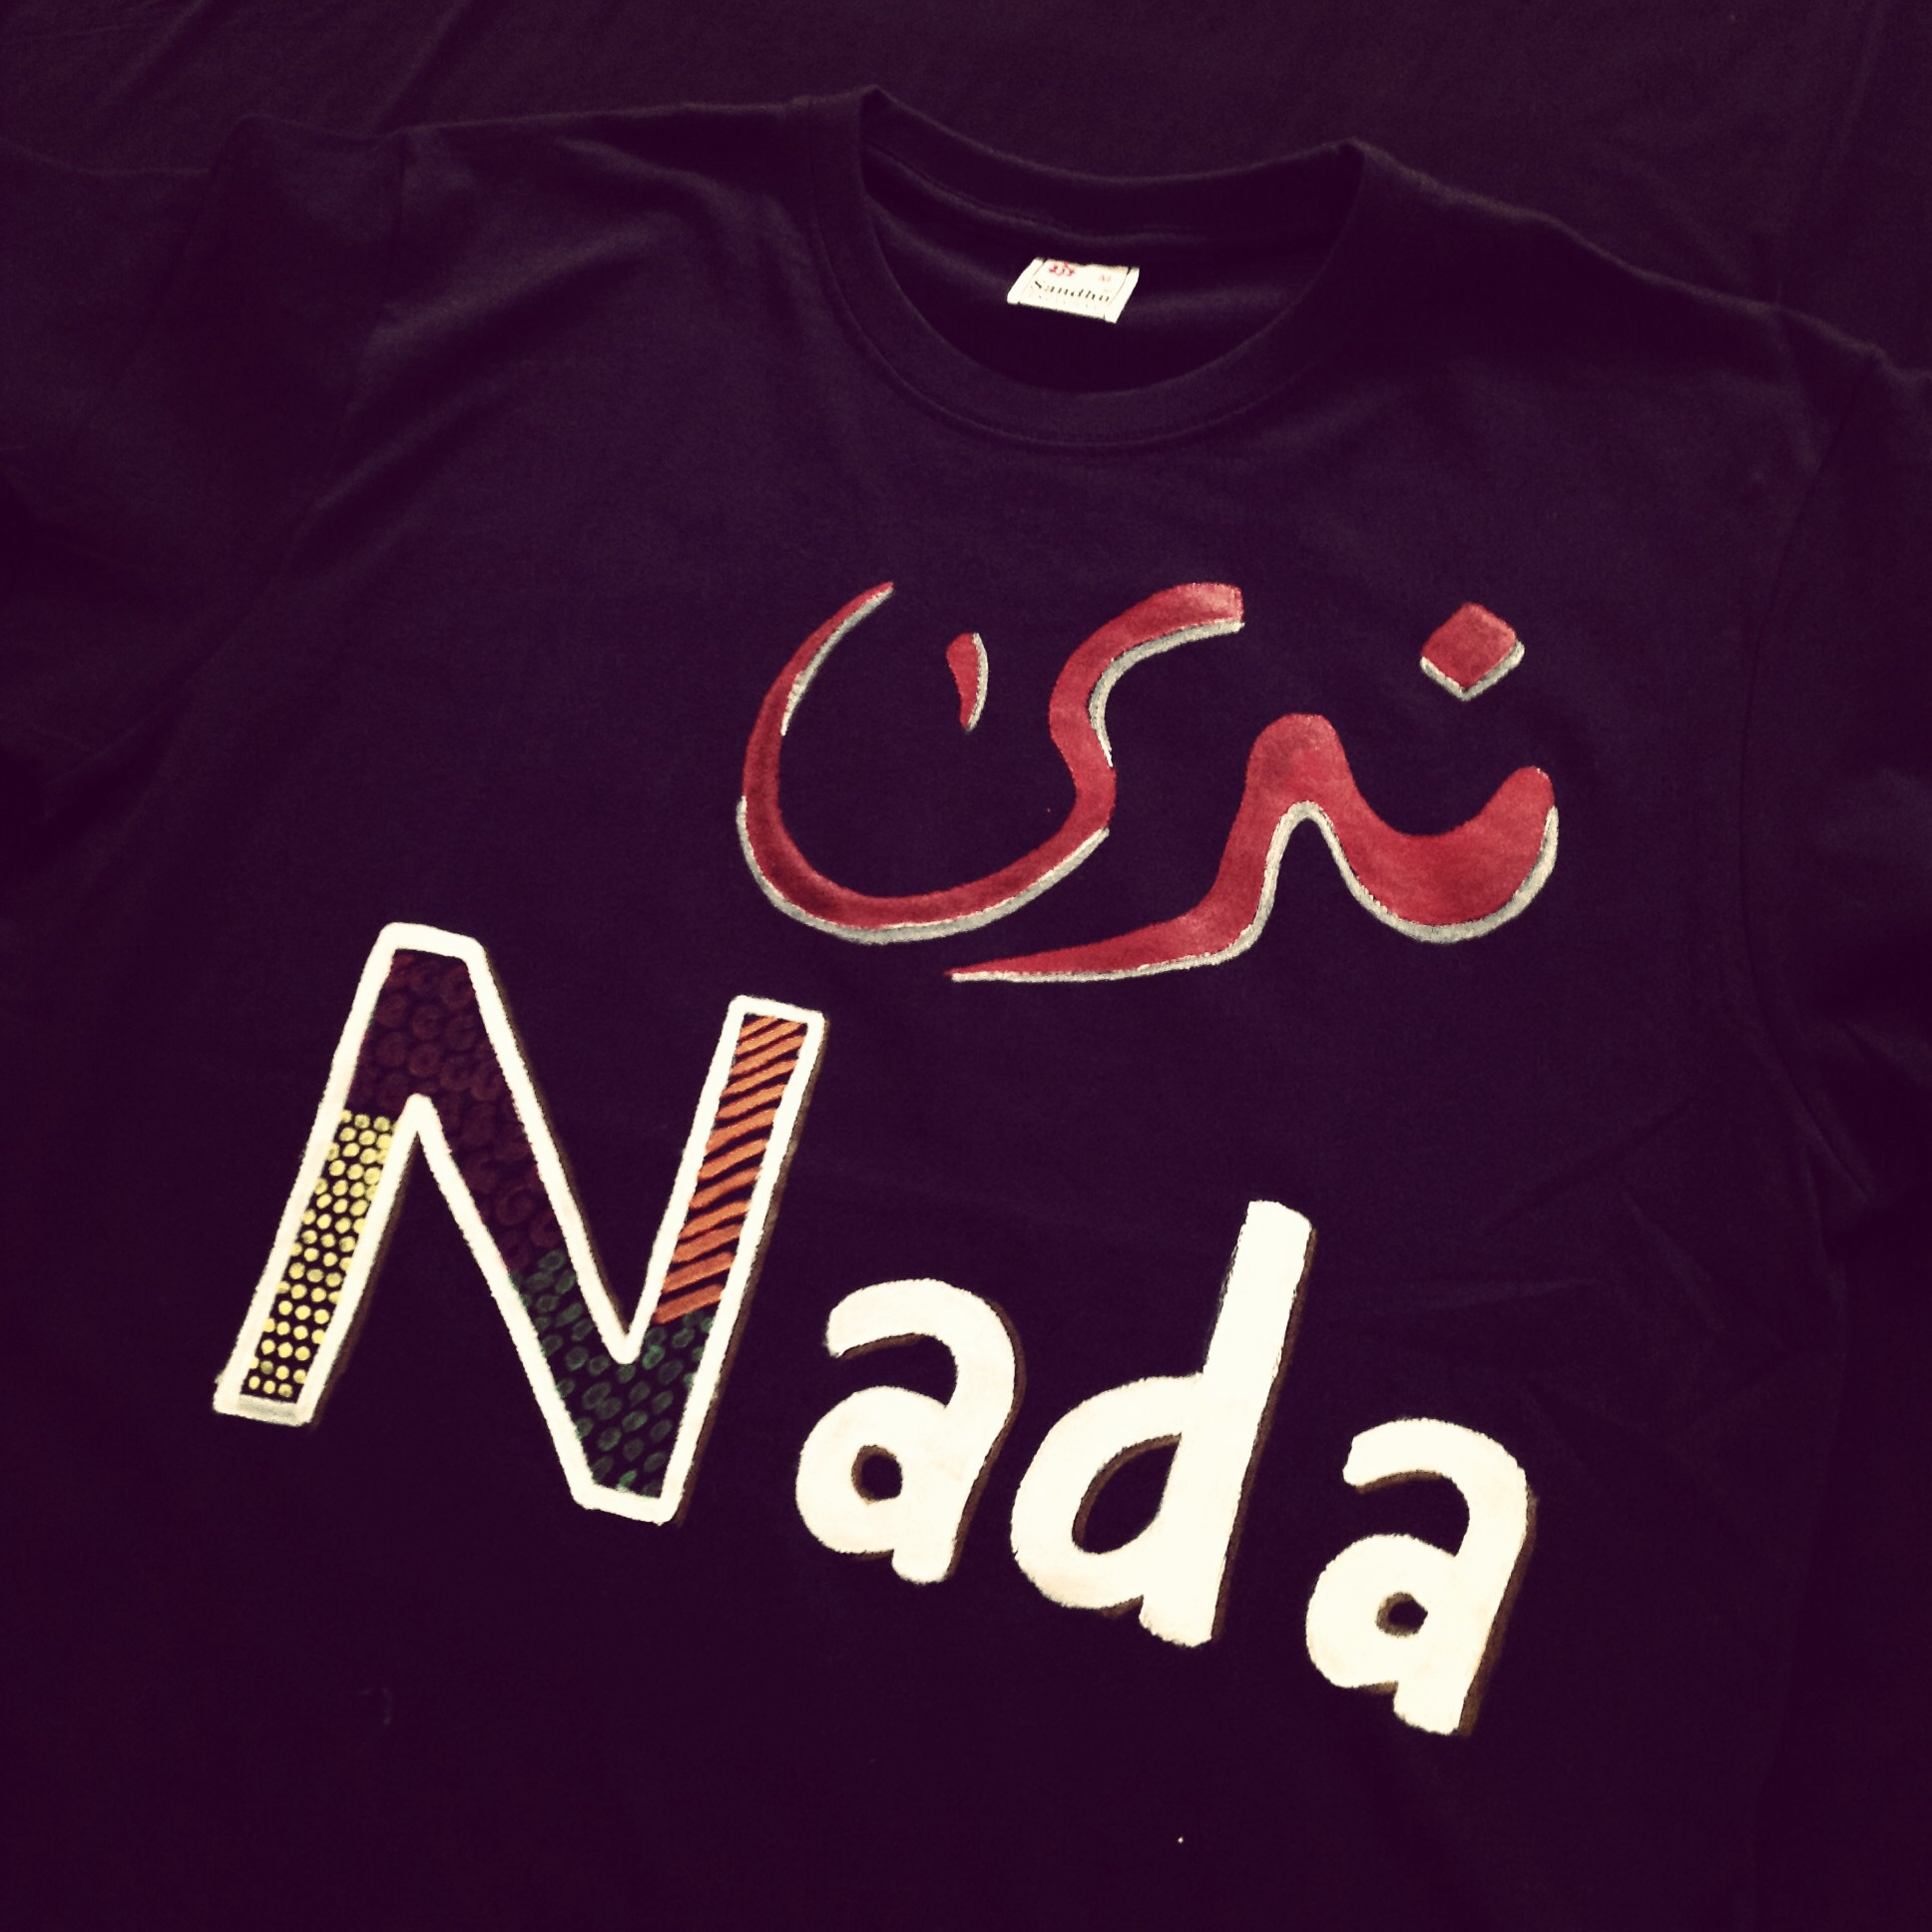 بالصور صور اسم ندى , اجمل خلفيات فيسبوك باسم ندى